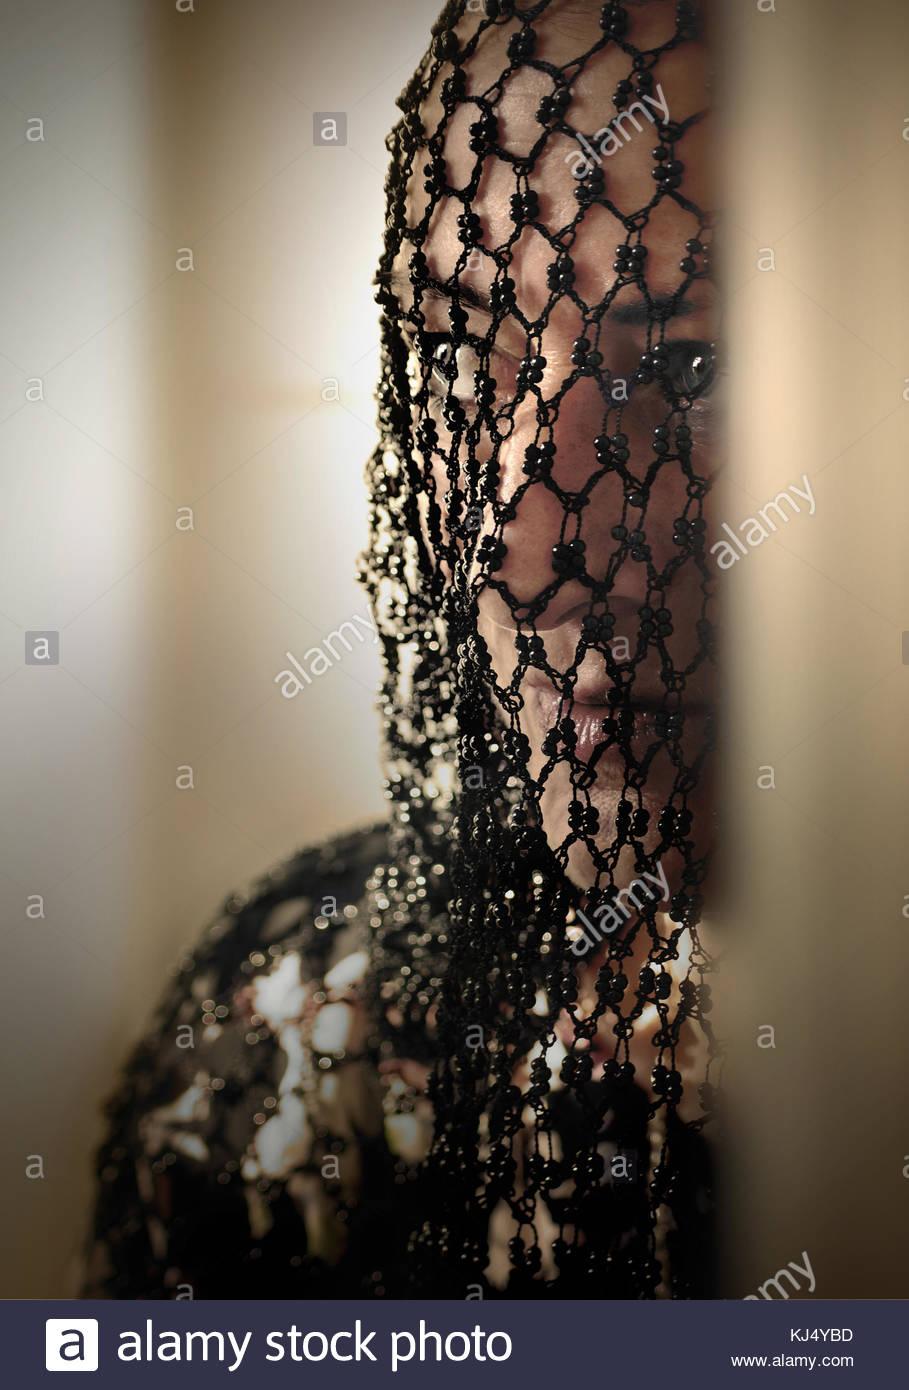 Veiled woman portrait - Stock Image